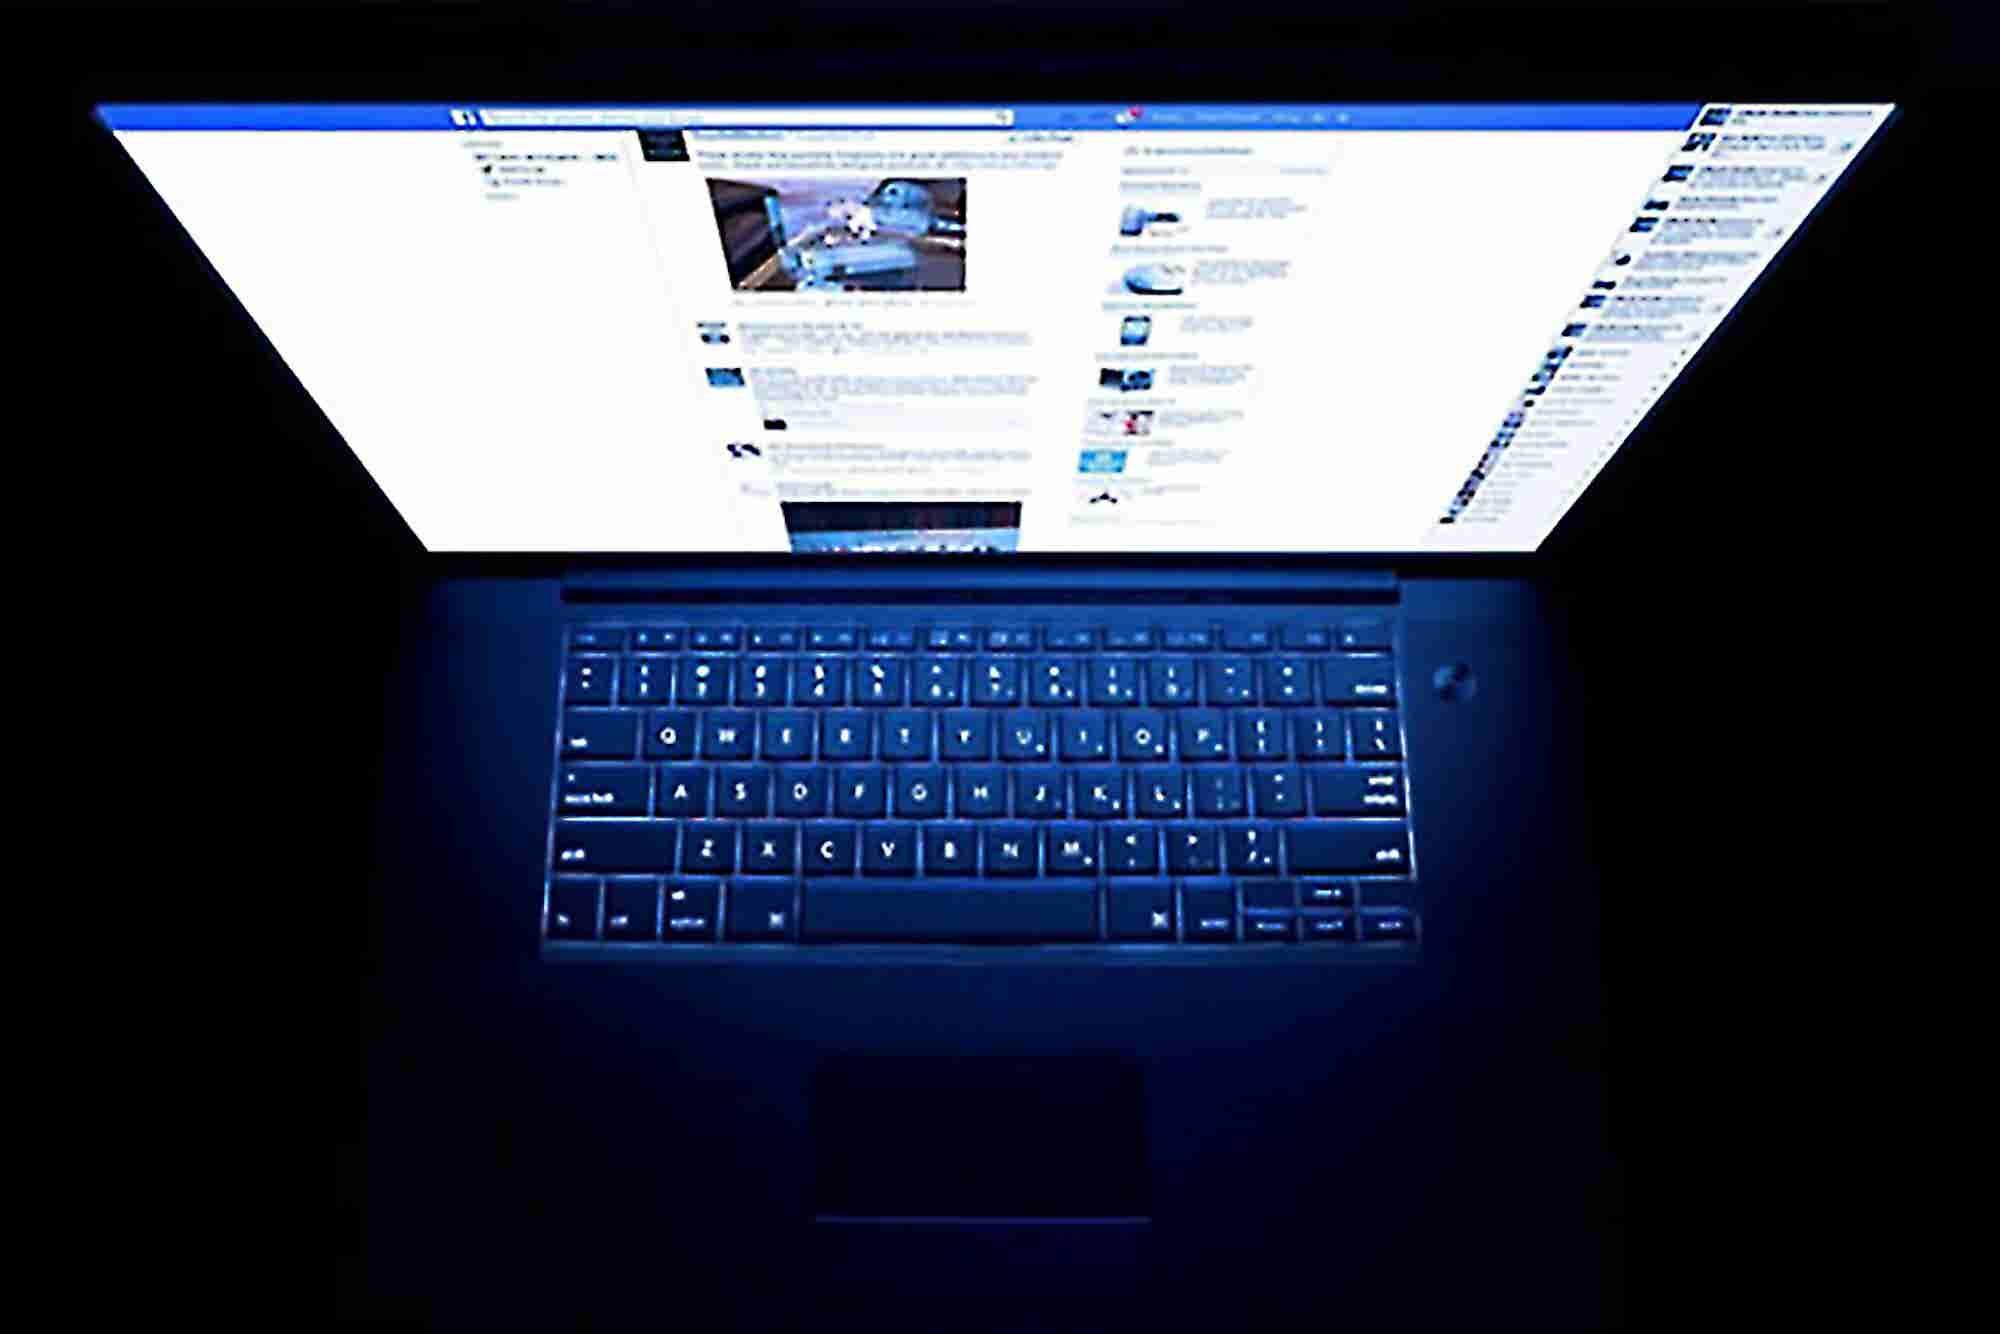 3 Bad Mistakes Good People Make on Facebook